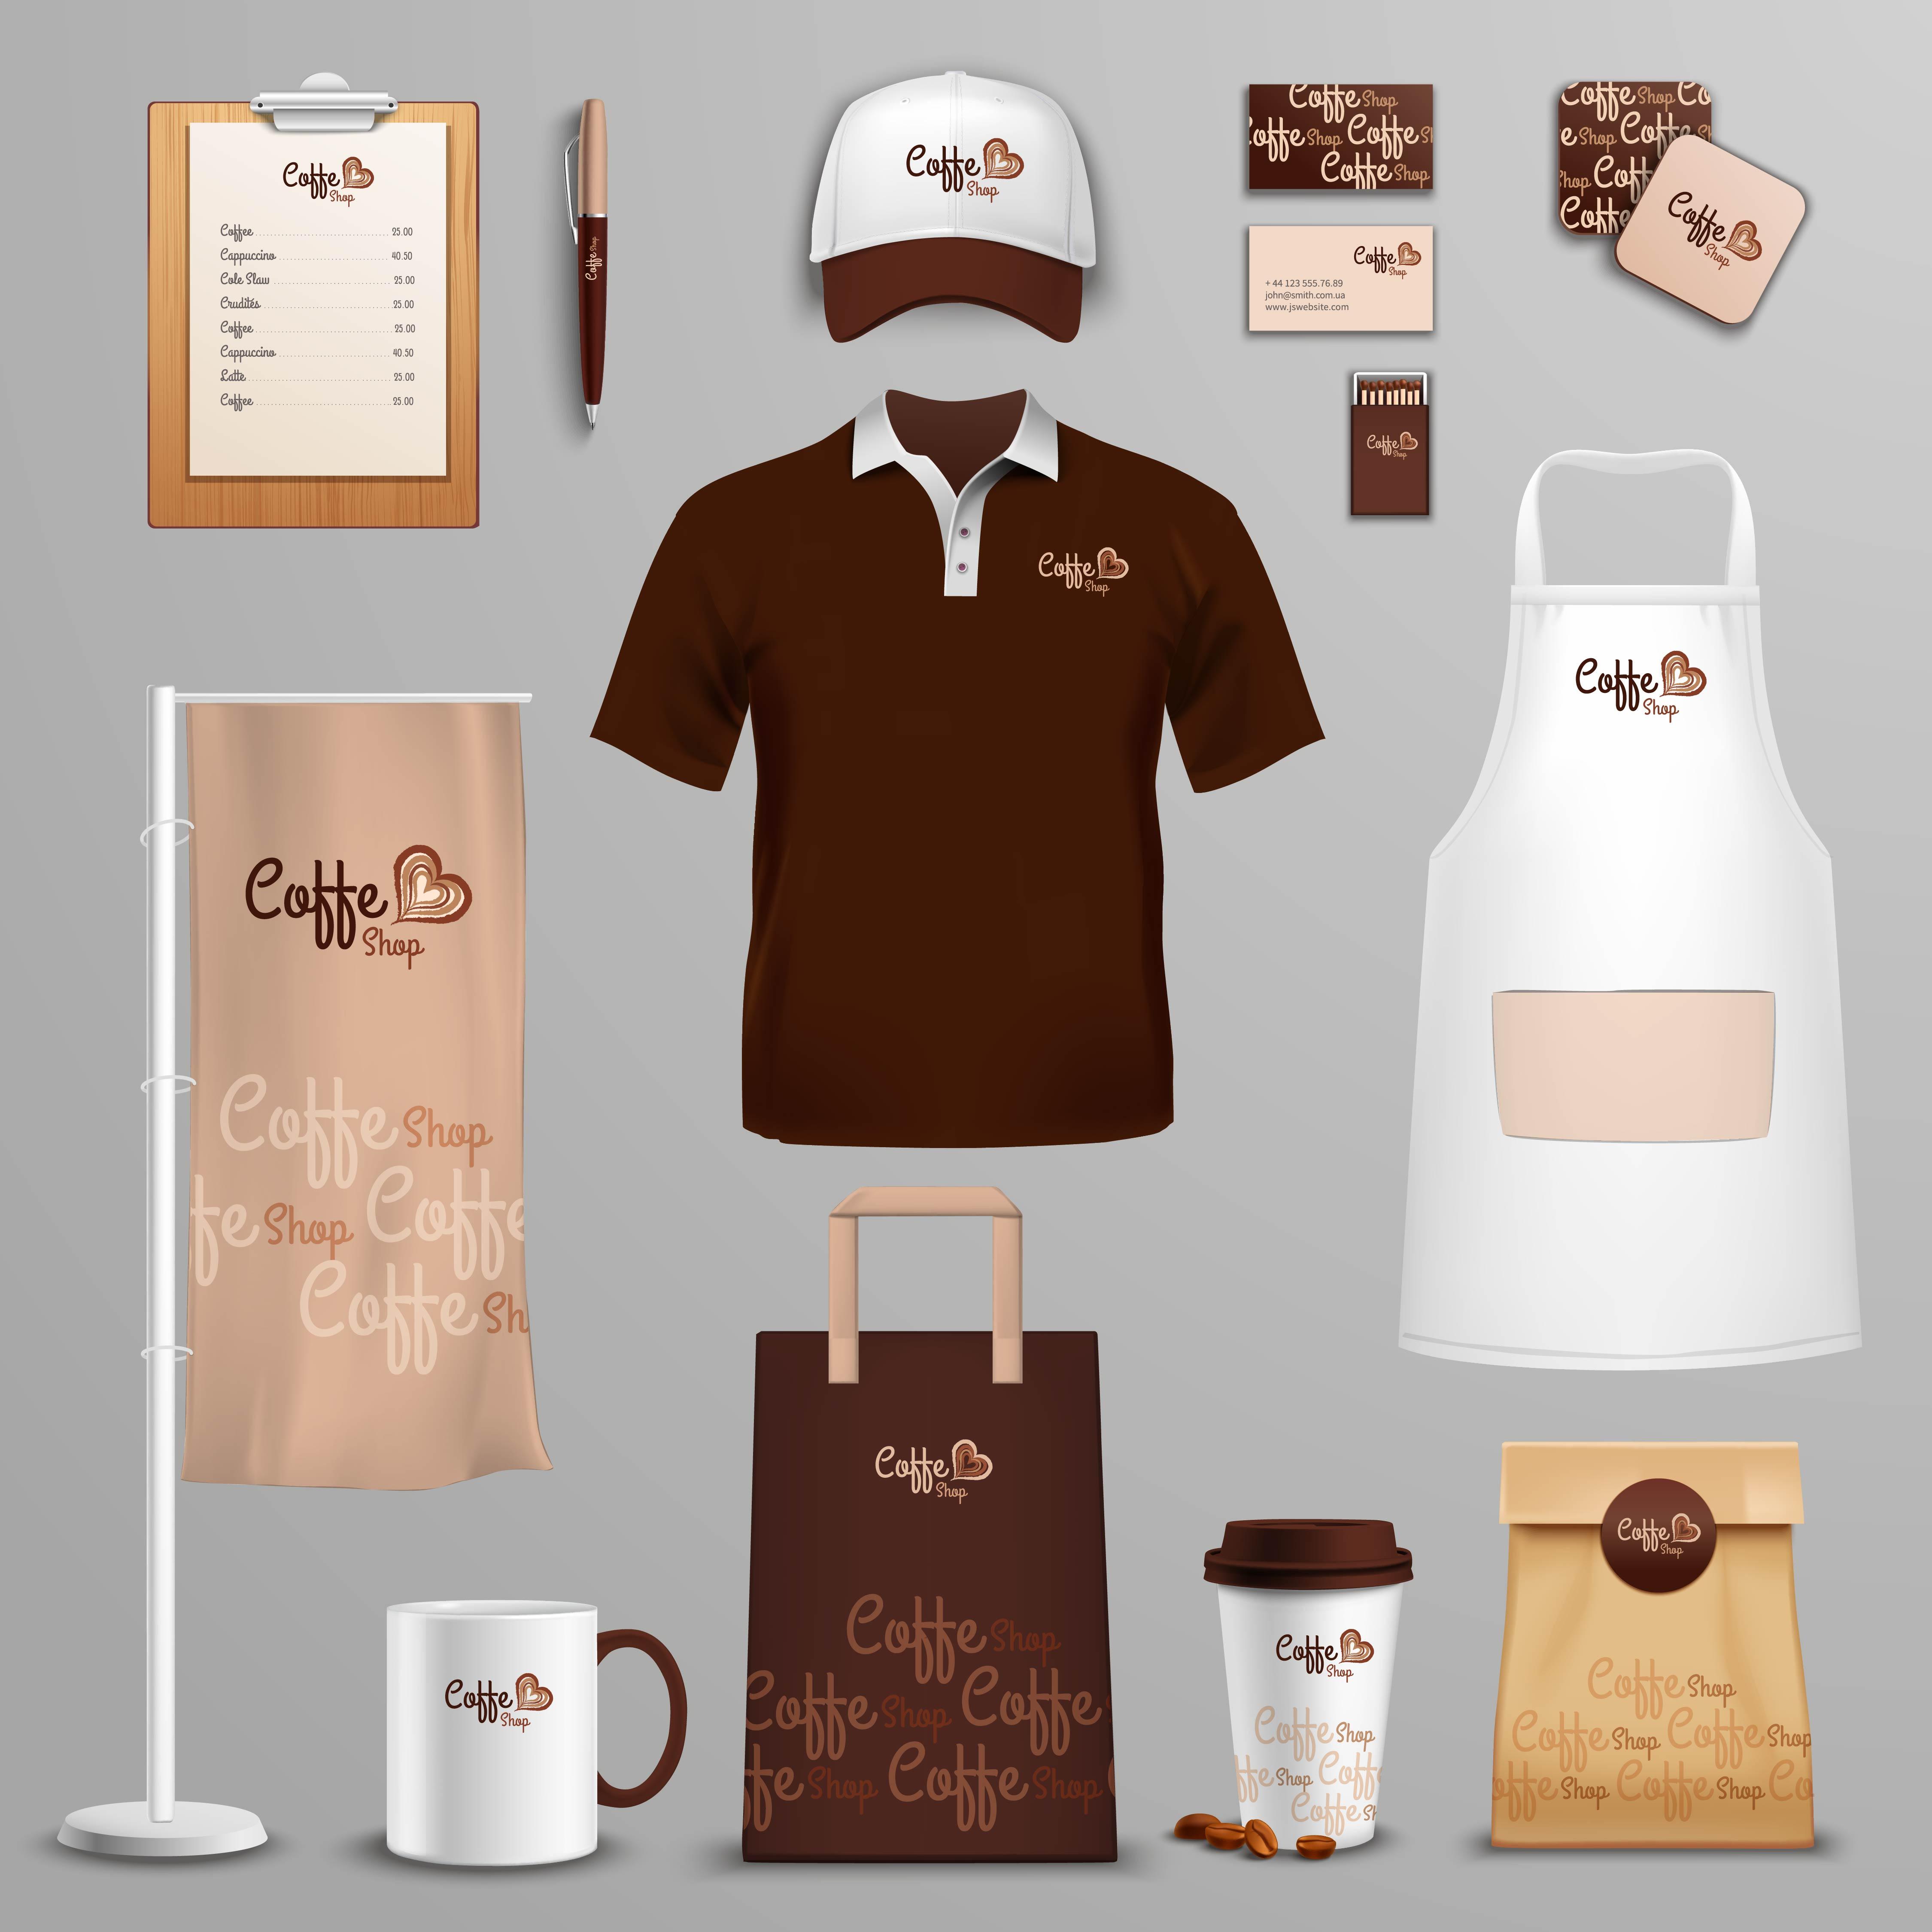 Restaurant Cafe Corporate Identity Icons Set 468689